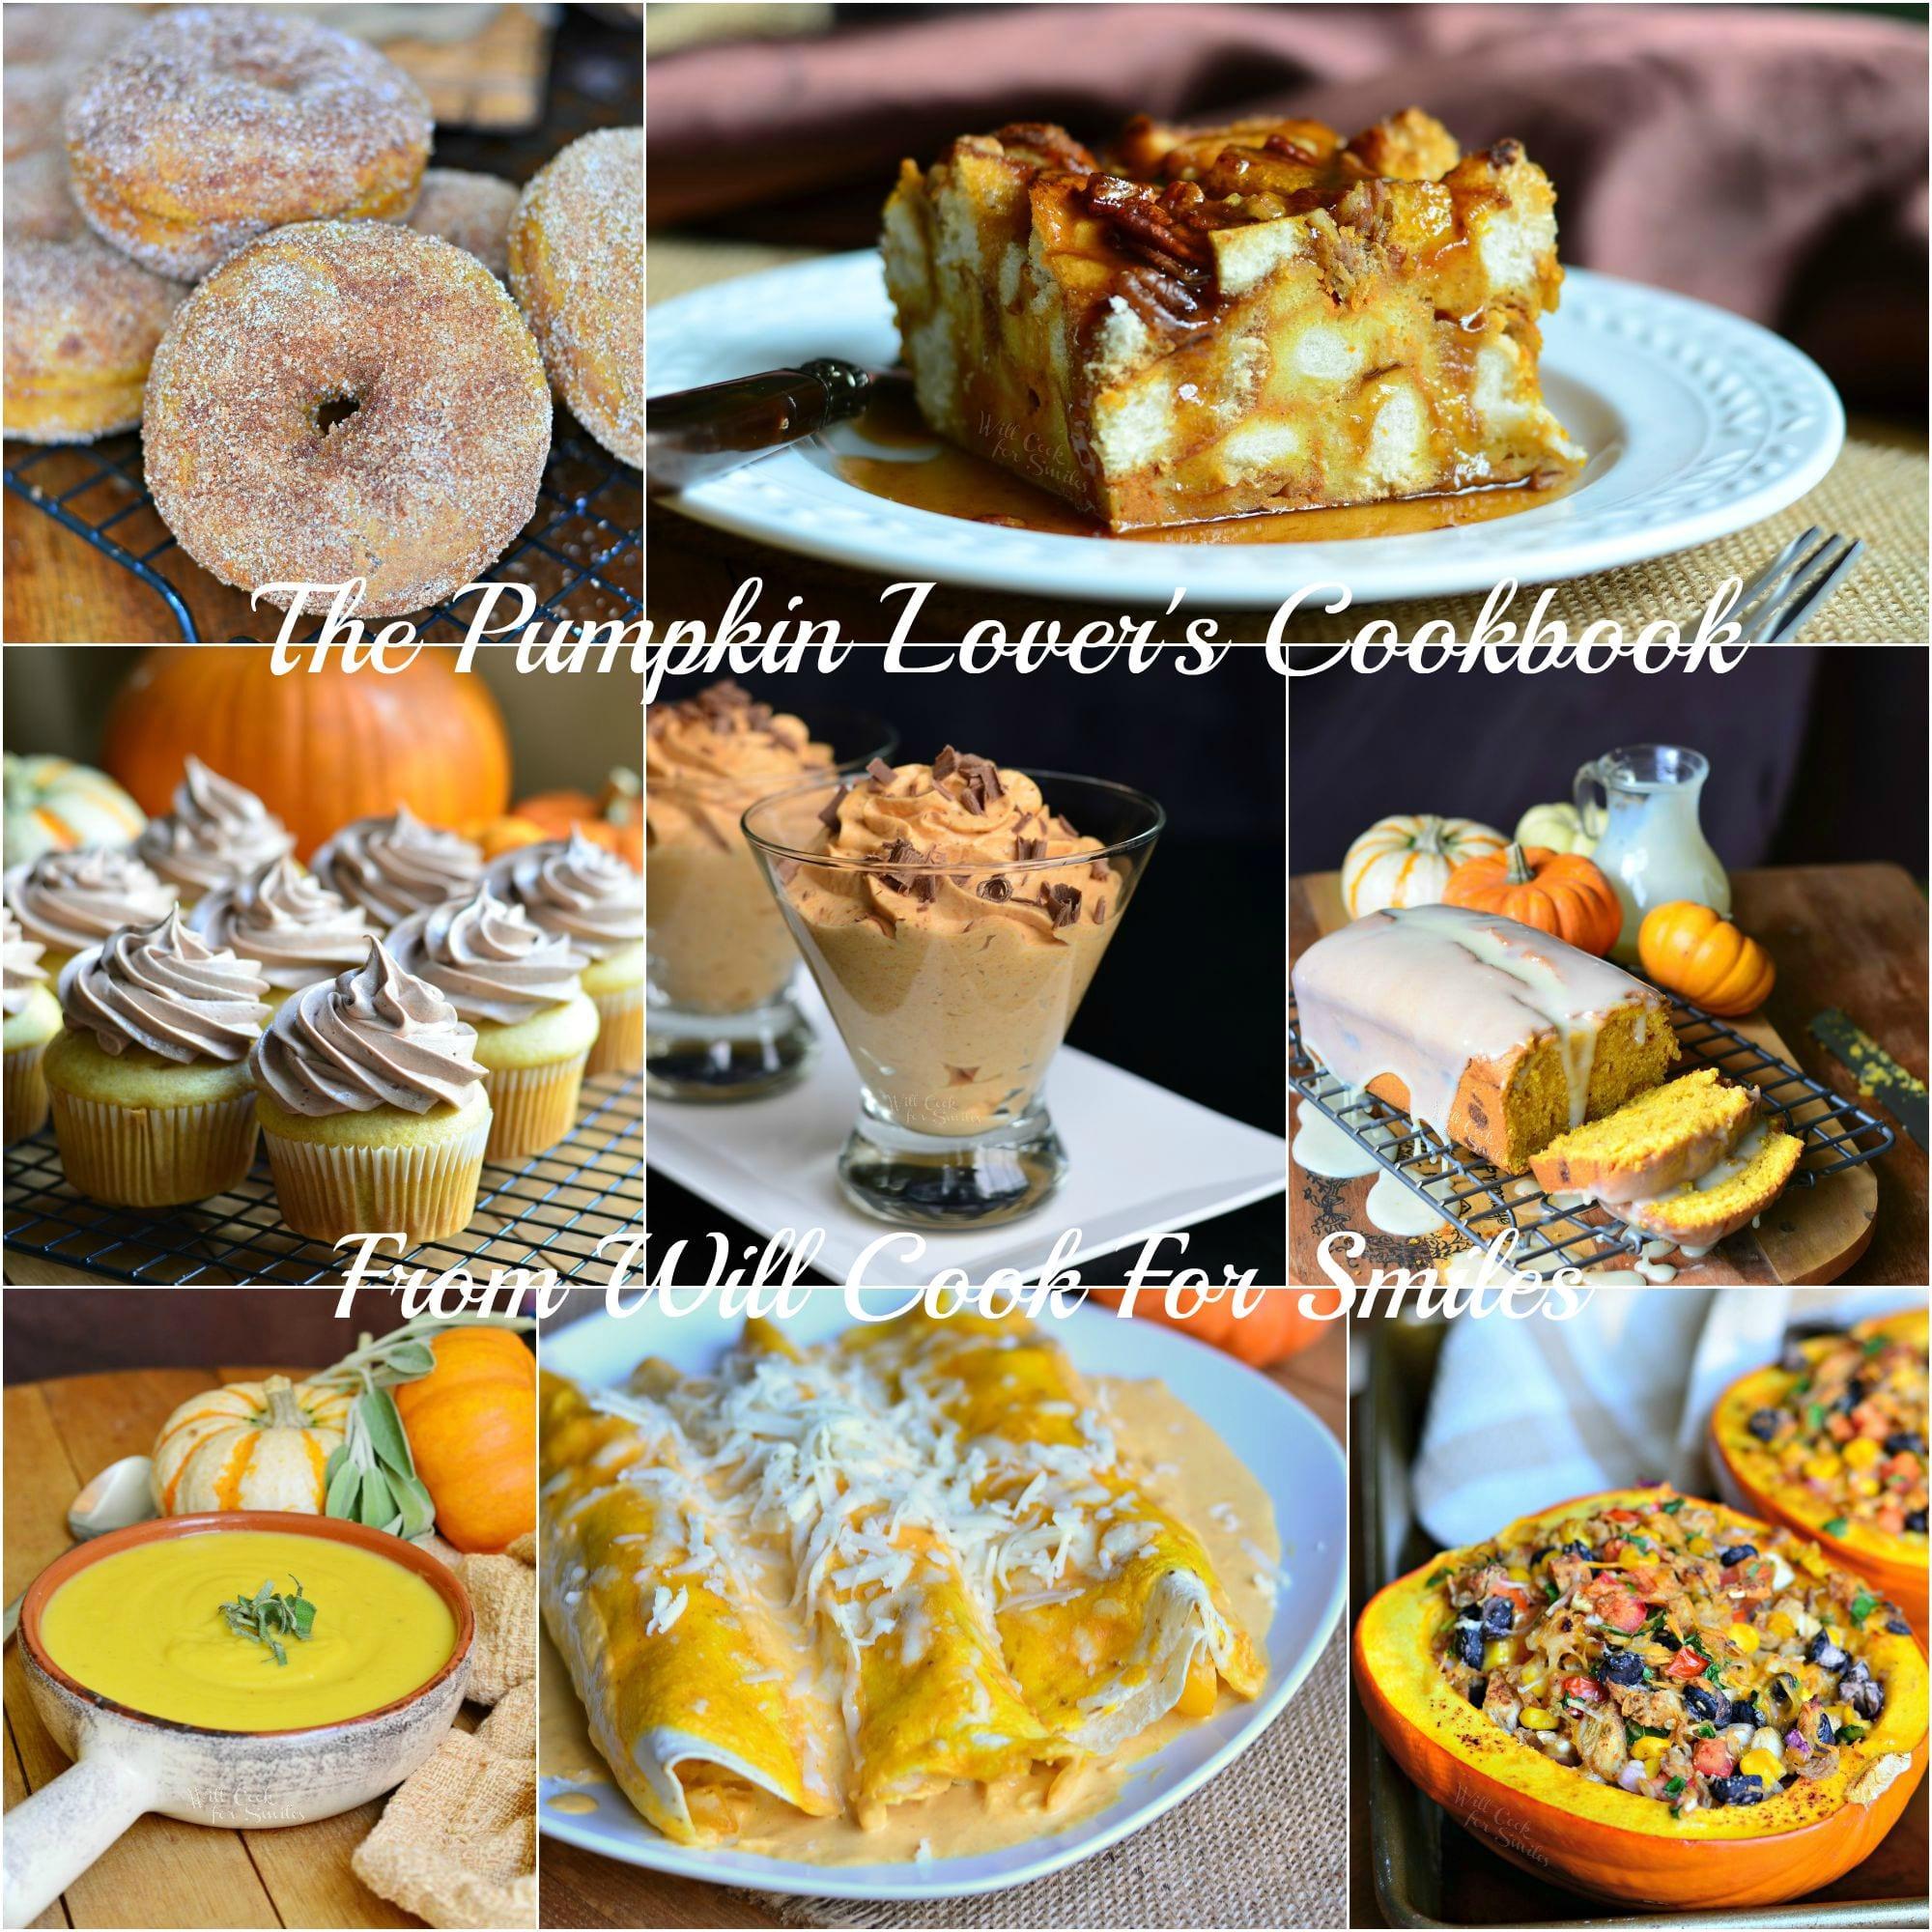 Some Pumpkin Recipes Found in the Pumpkin Lover's Cookbook